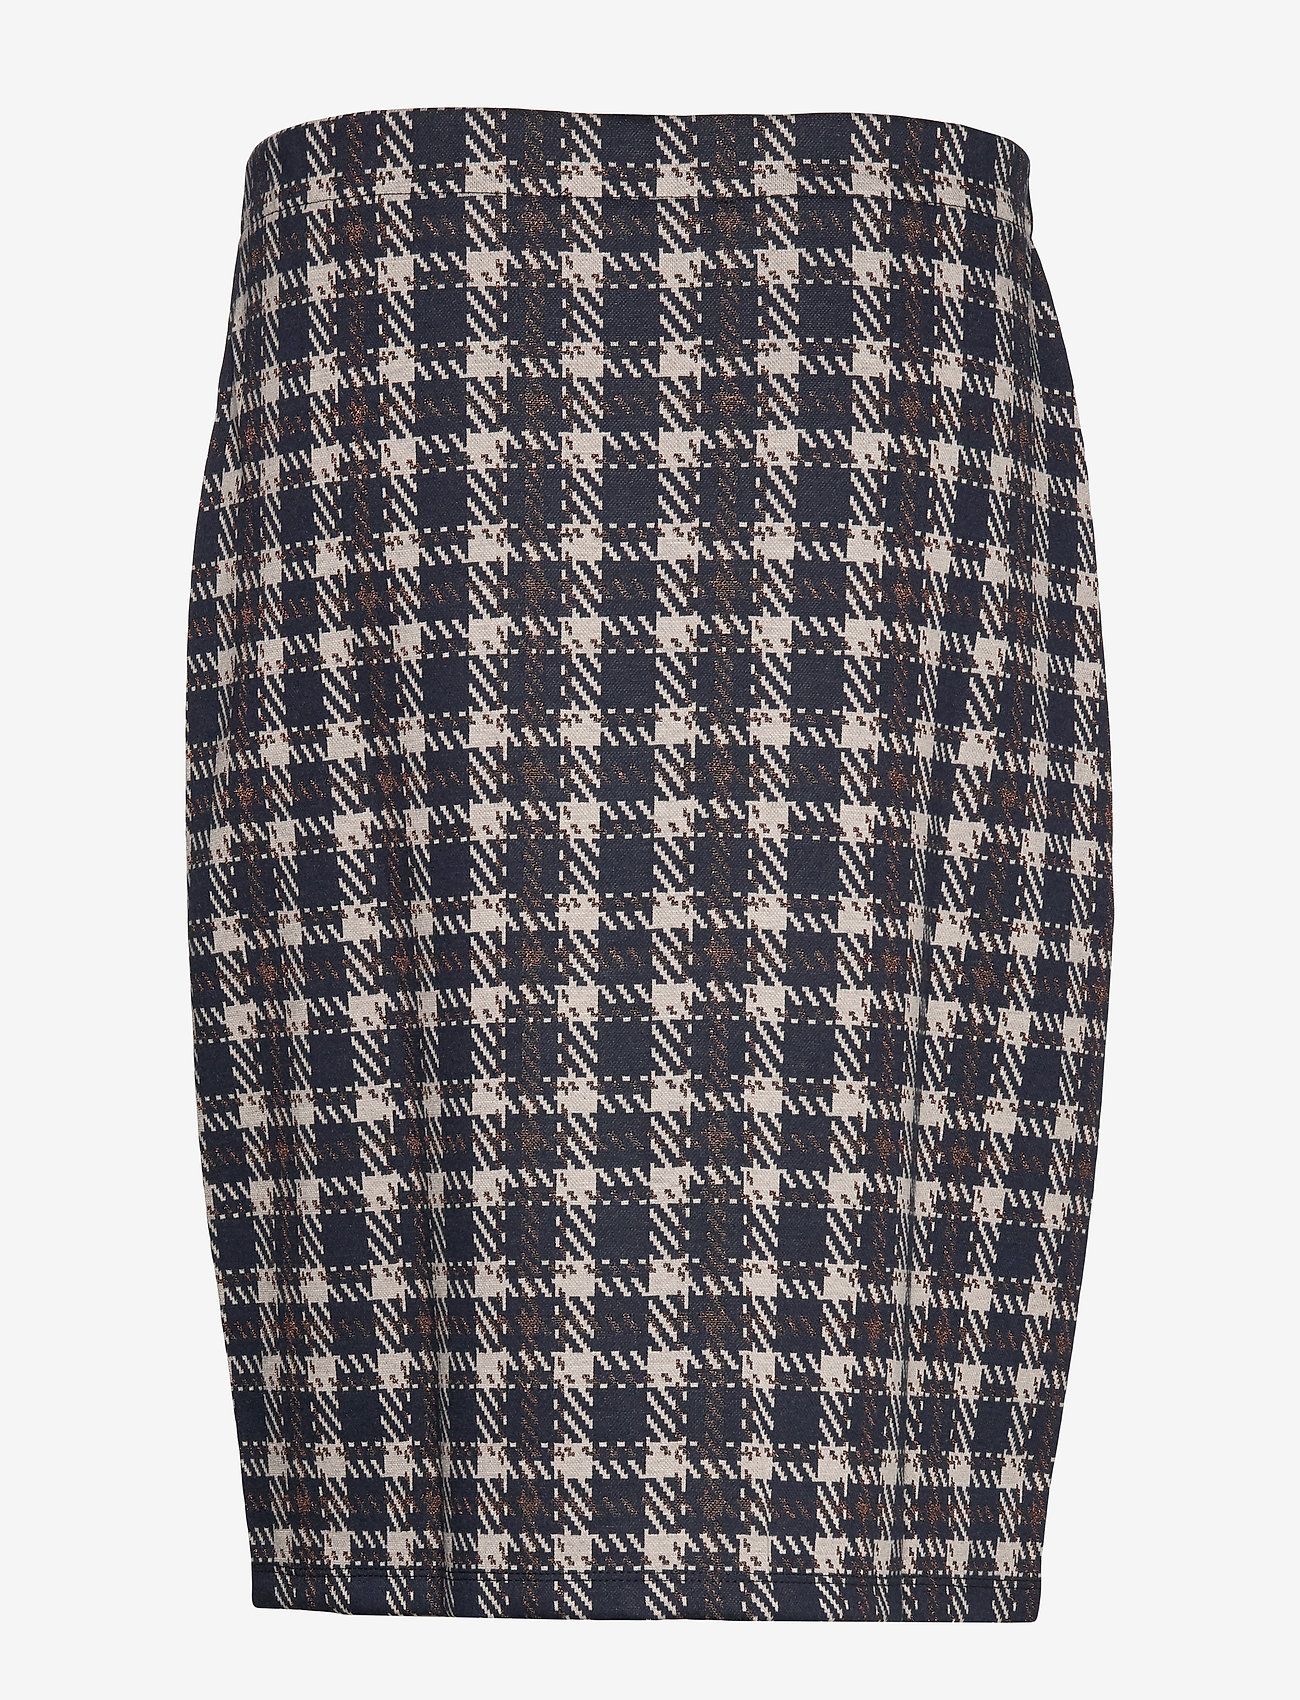 Skirt Medium Length Classic (Dark Blue/brown) (339.60 kr) - Betty Barclay